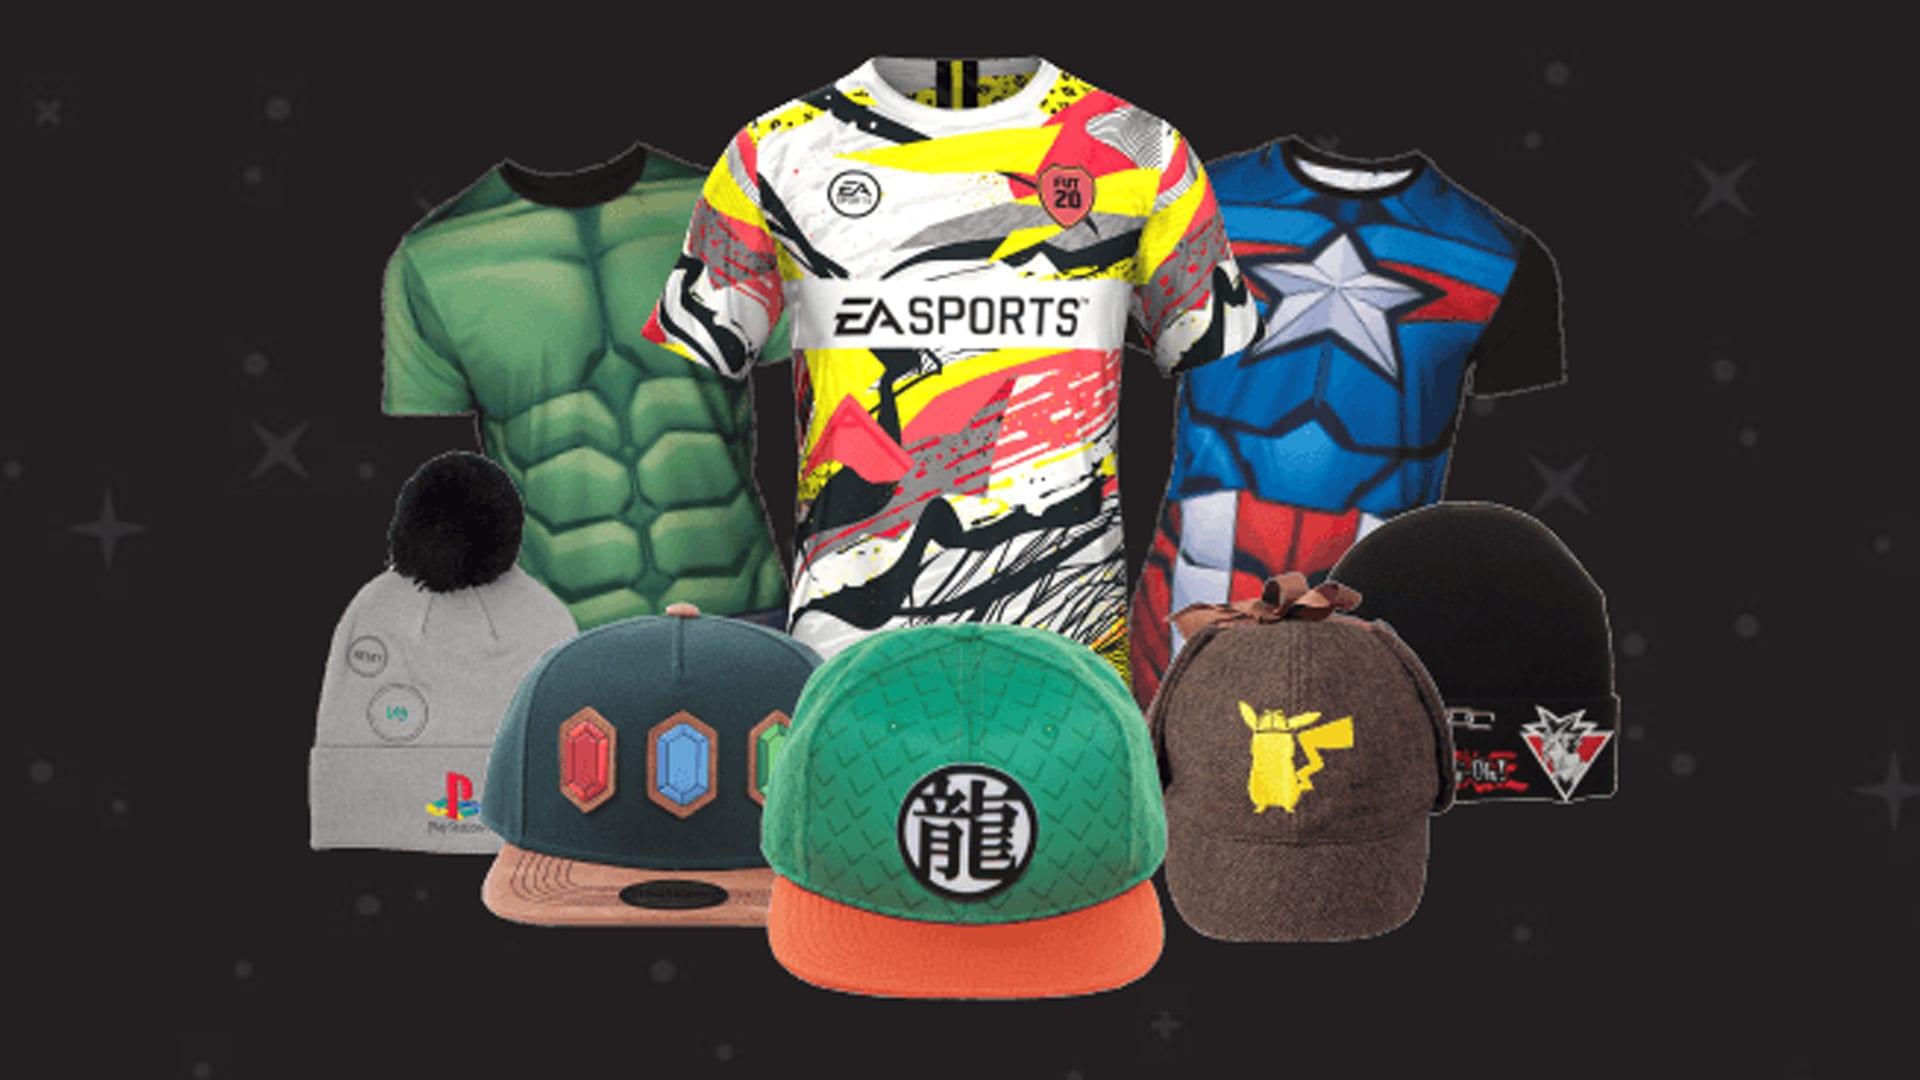 GameStop T-Shirts Cappies